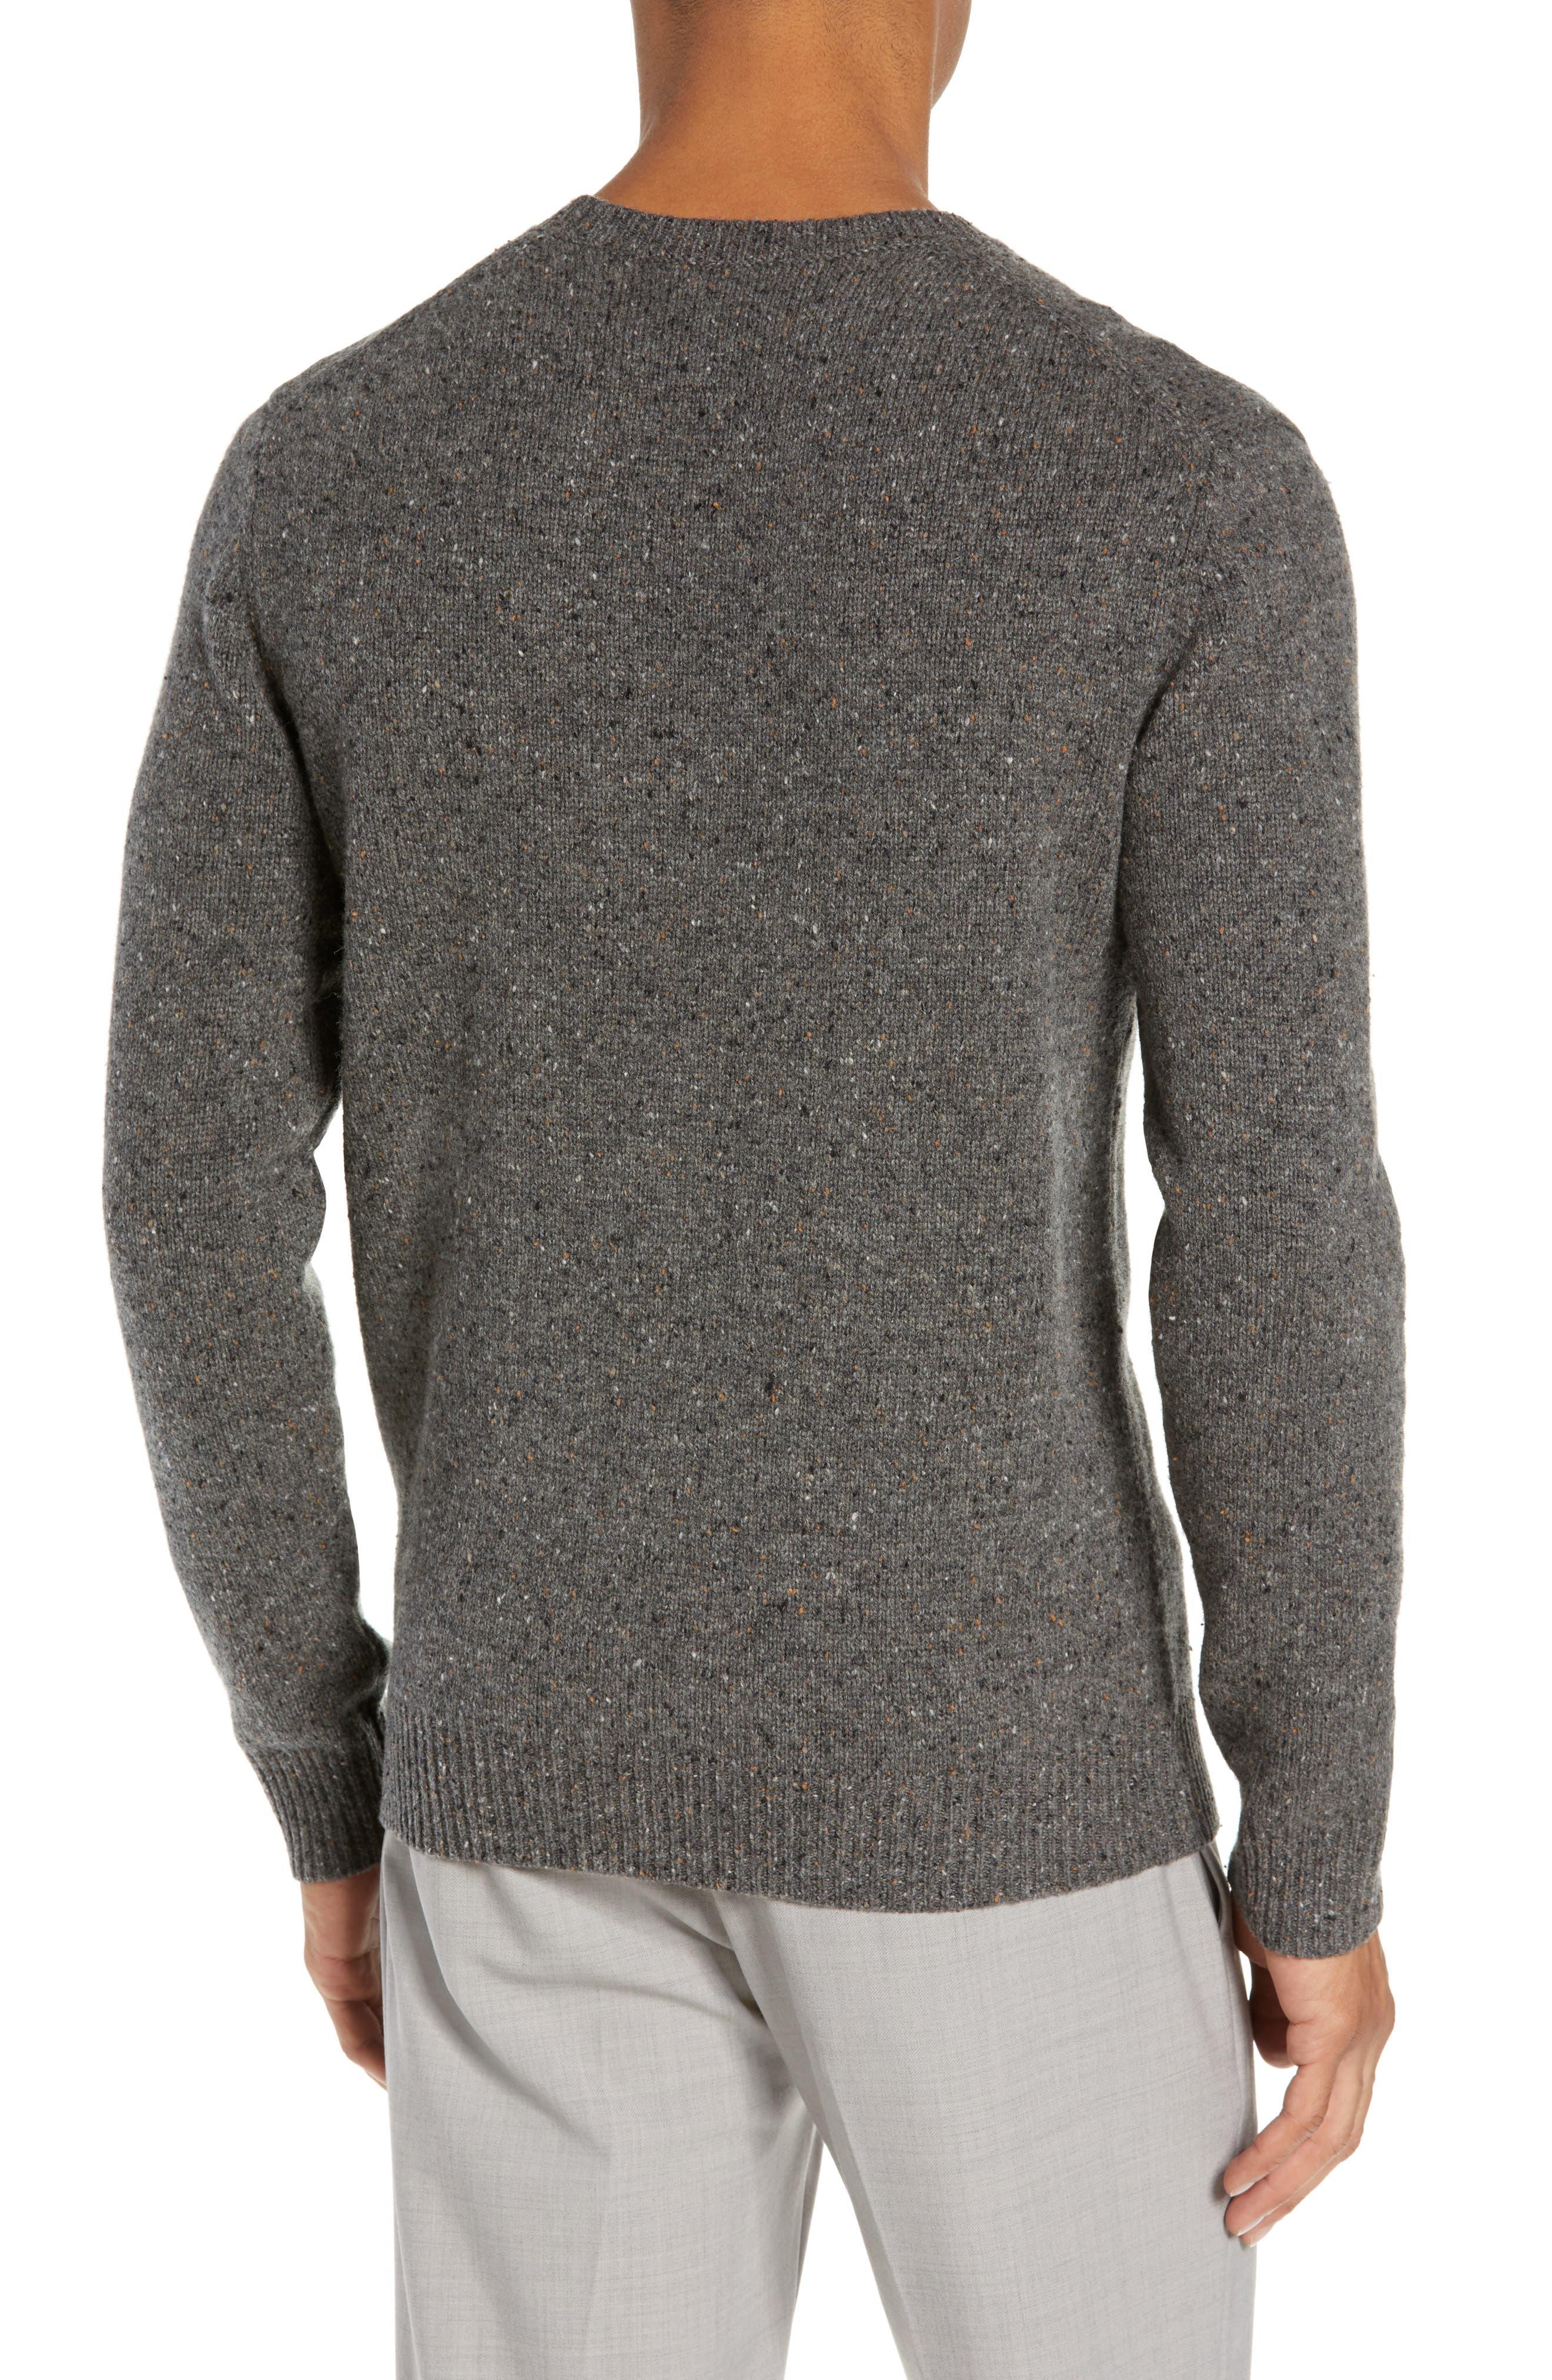 Jaxon Trim Fit Wool Sweater,                             Alternate thumbnail 2, color,                             GREY MULTI